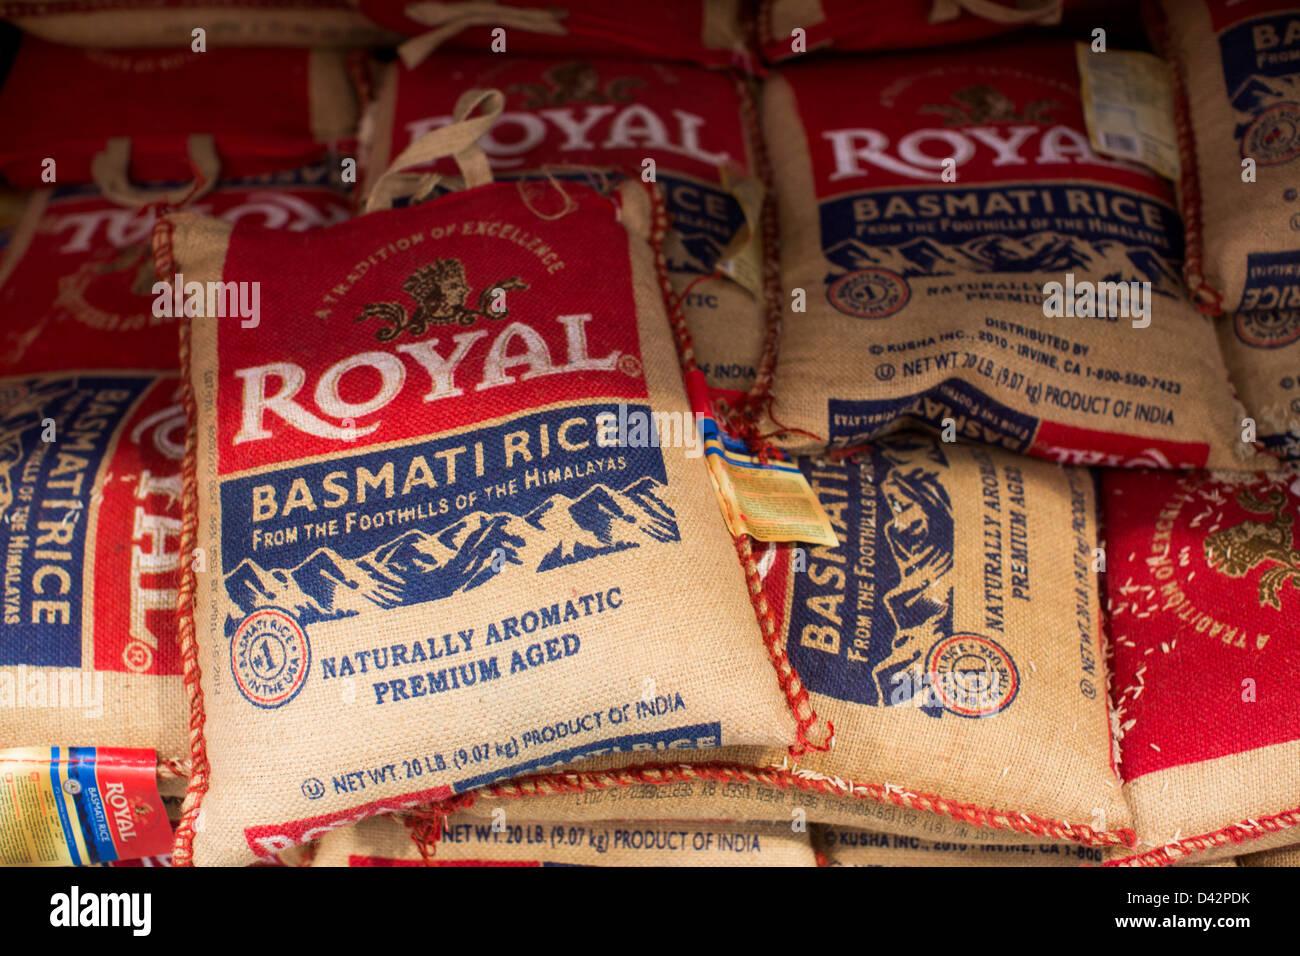 Basmati rice on display at a Costco Wholesale Warehouse Club Stock